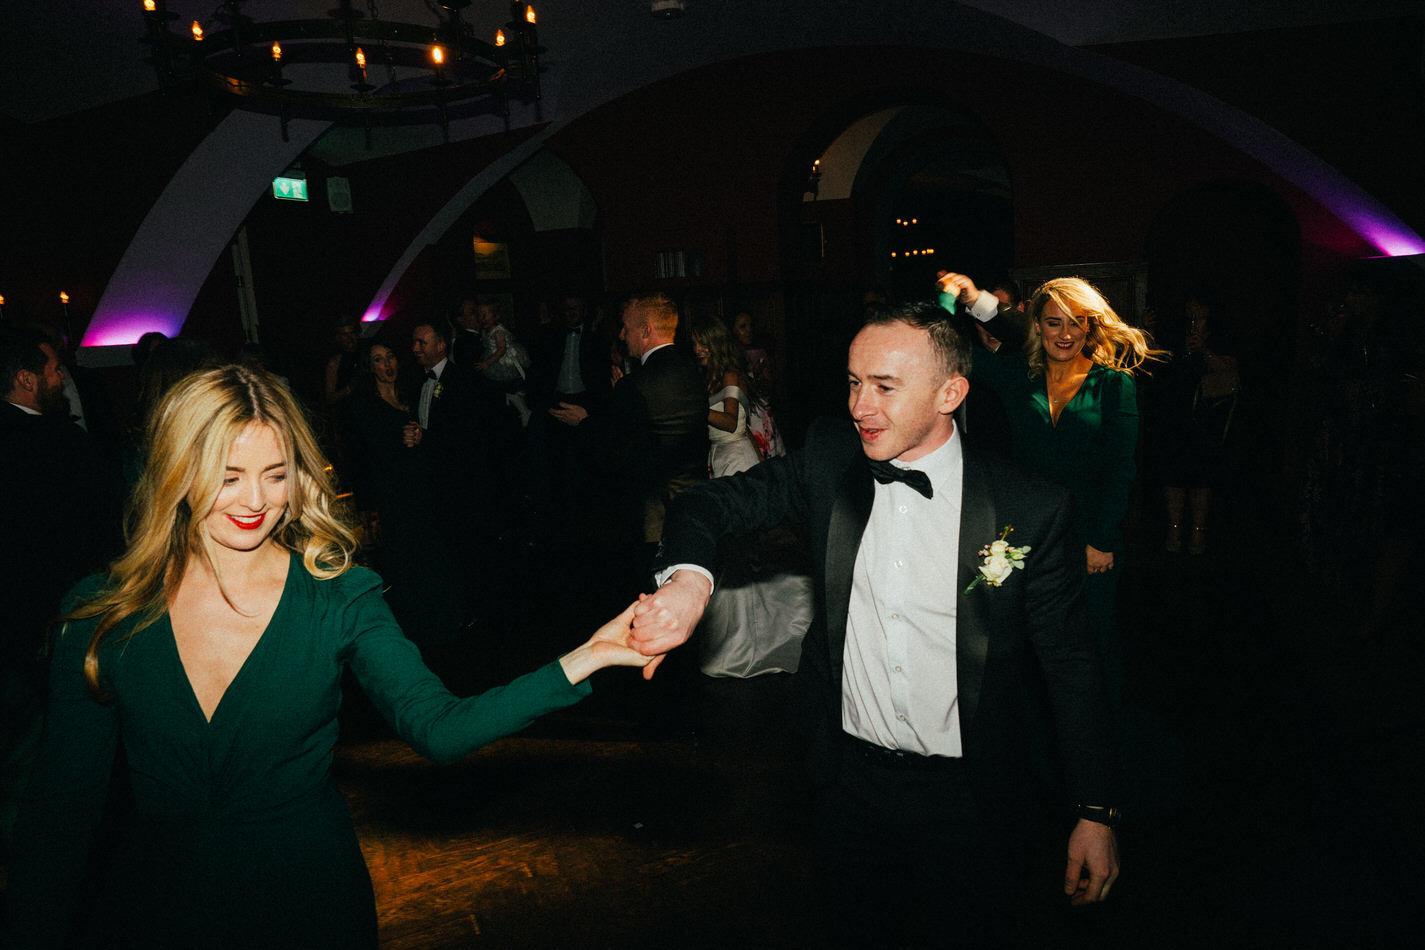 Castle-wedding-ireland-photos- 0331 244